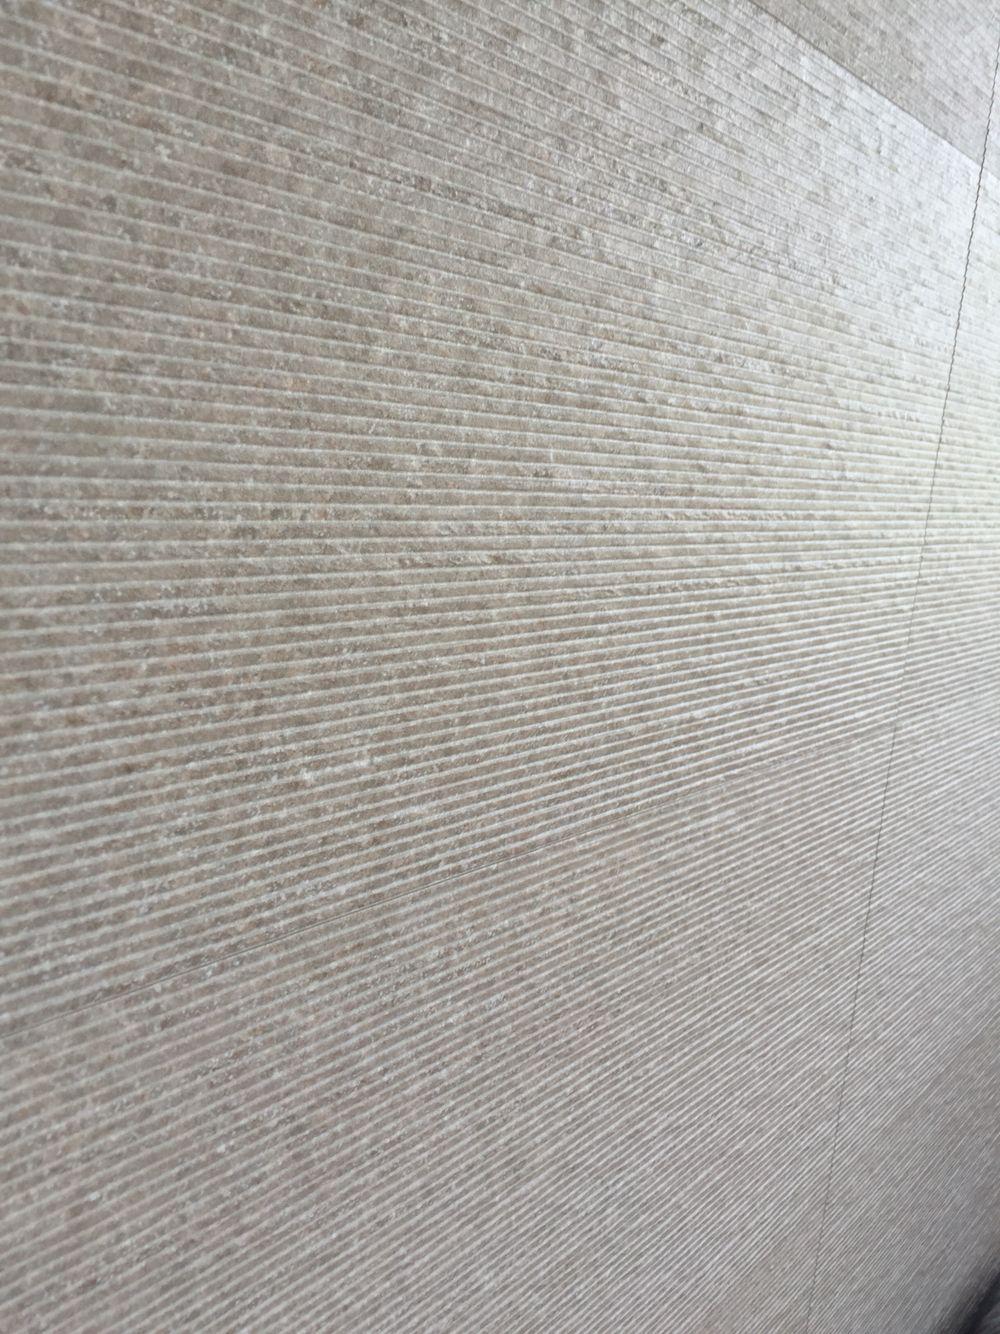 Venis badkamer tegels badkamertegels pinterest tegels badkamer en travertijn - Porcelanosa tegel badkamer ...